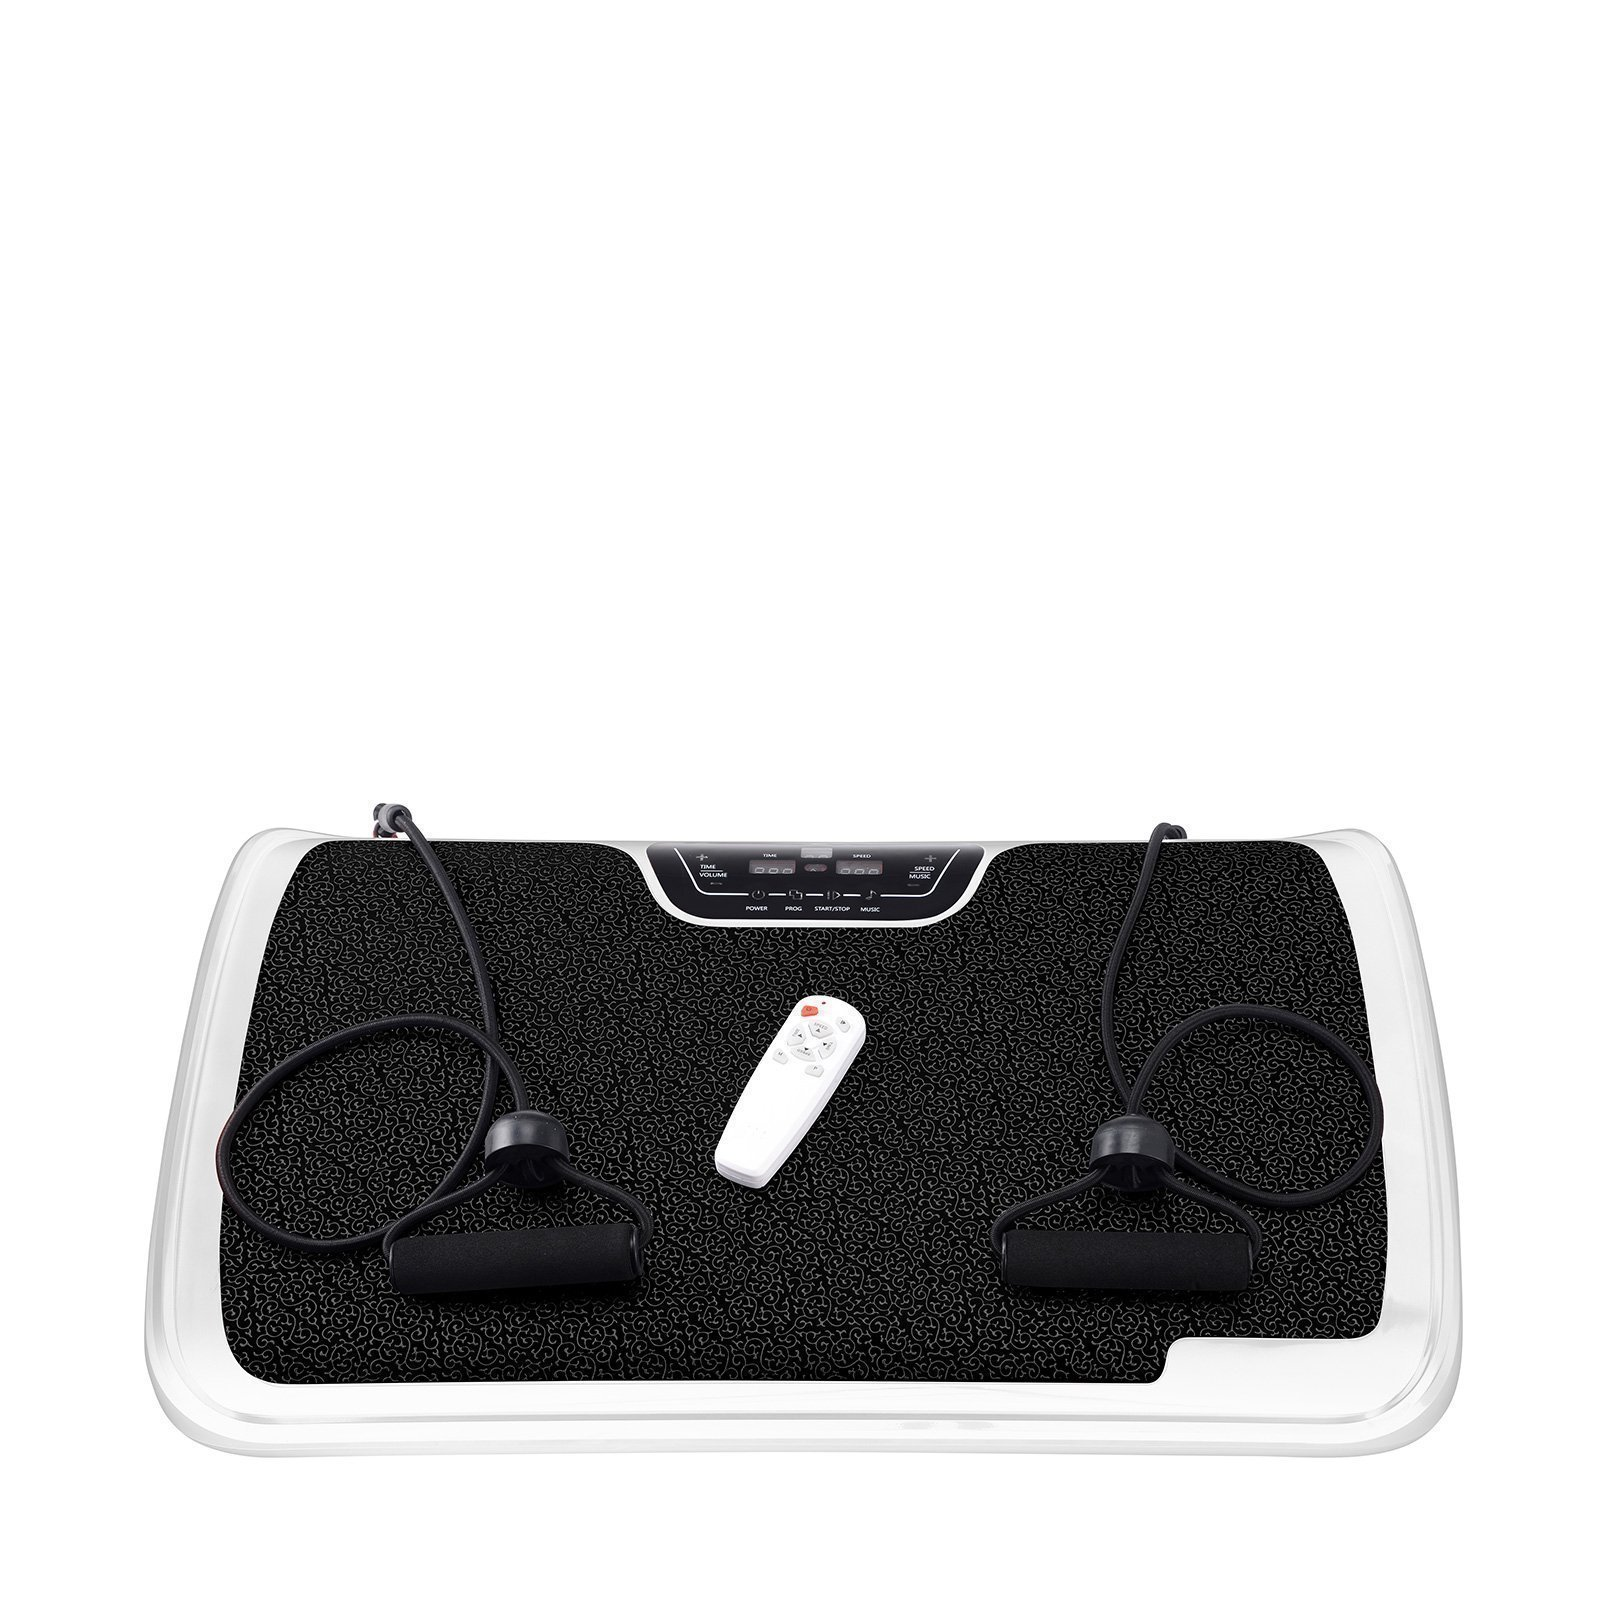 VibroSlim Tone Vibration Platform Fitness Machine, Oscillating Vibration Trainer + Free Workout DVD, Wall Chart & Resistance Bands (White) by VibroSlim (Image #4)